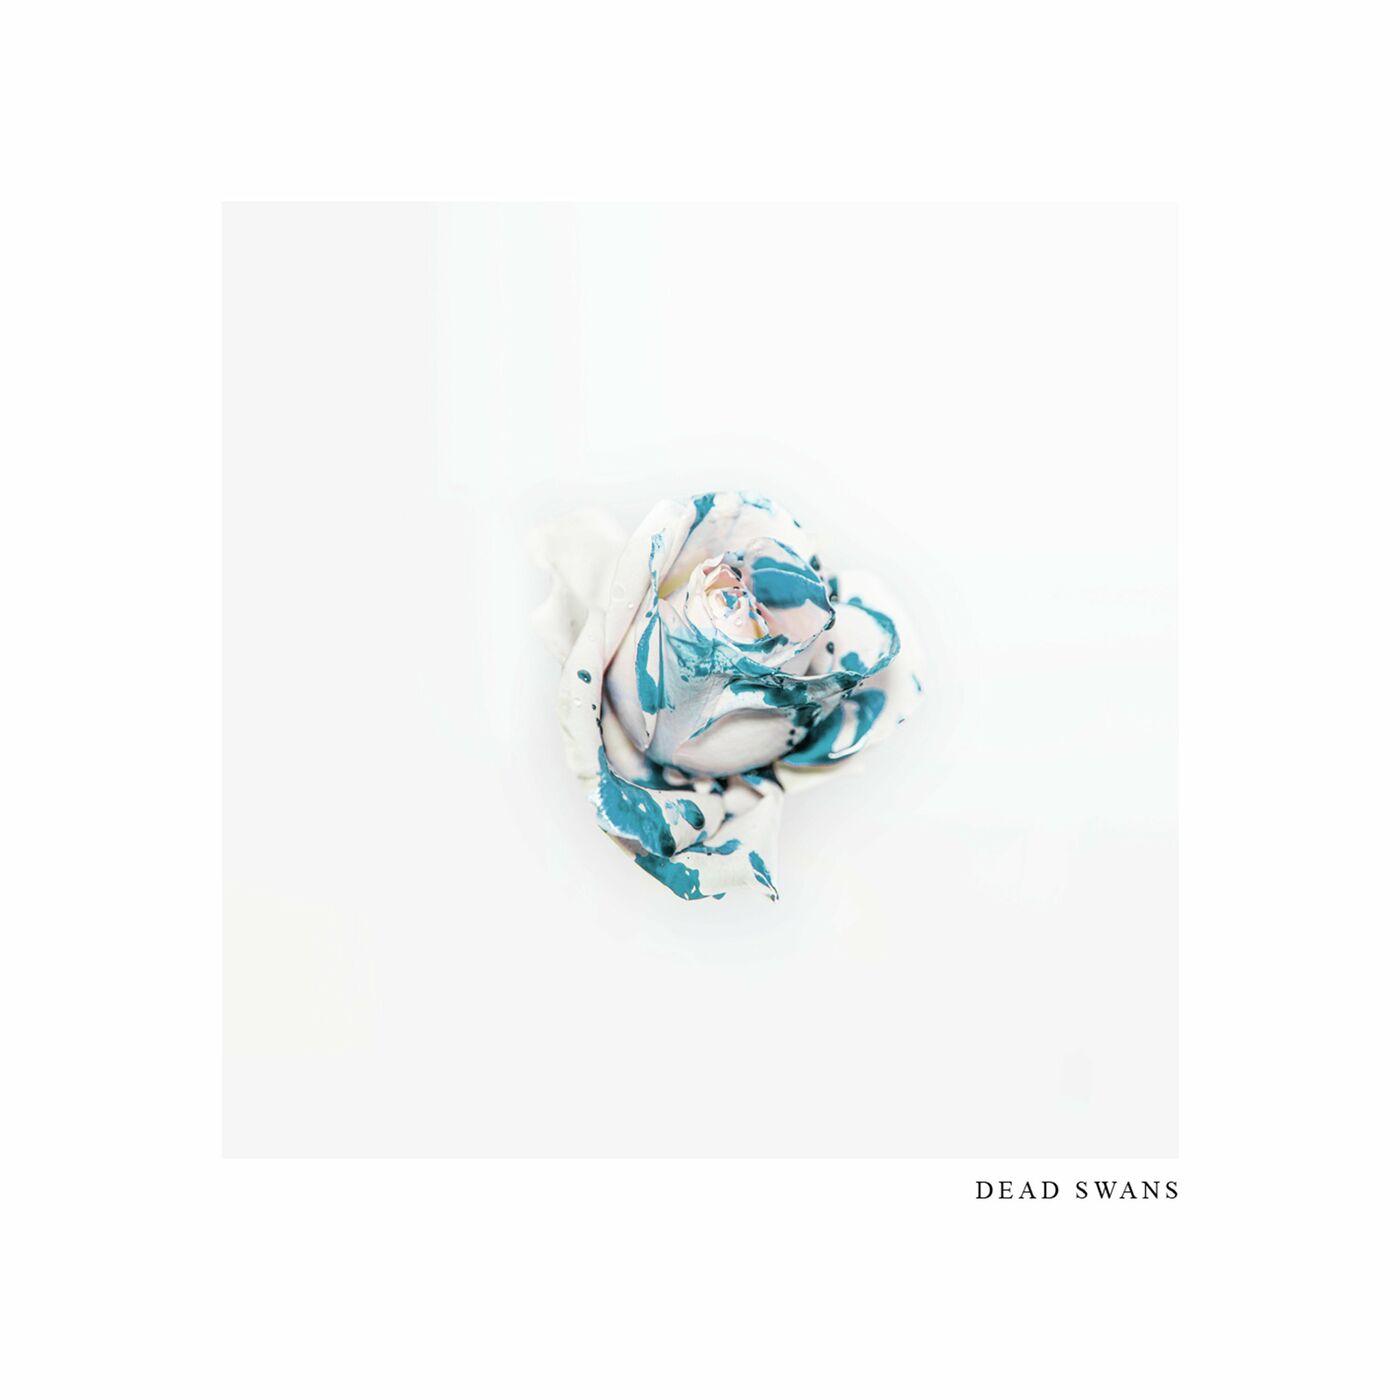 Amorla - Dead Swans [single] (2020)